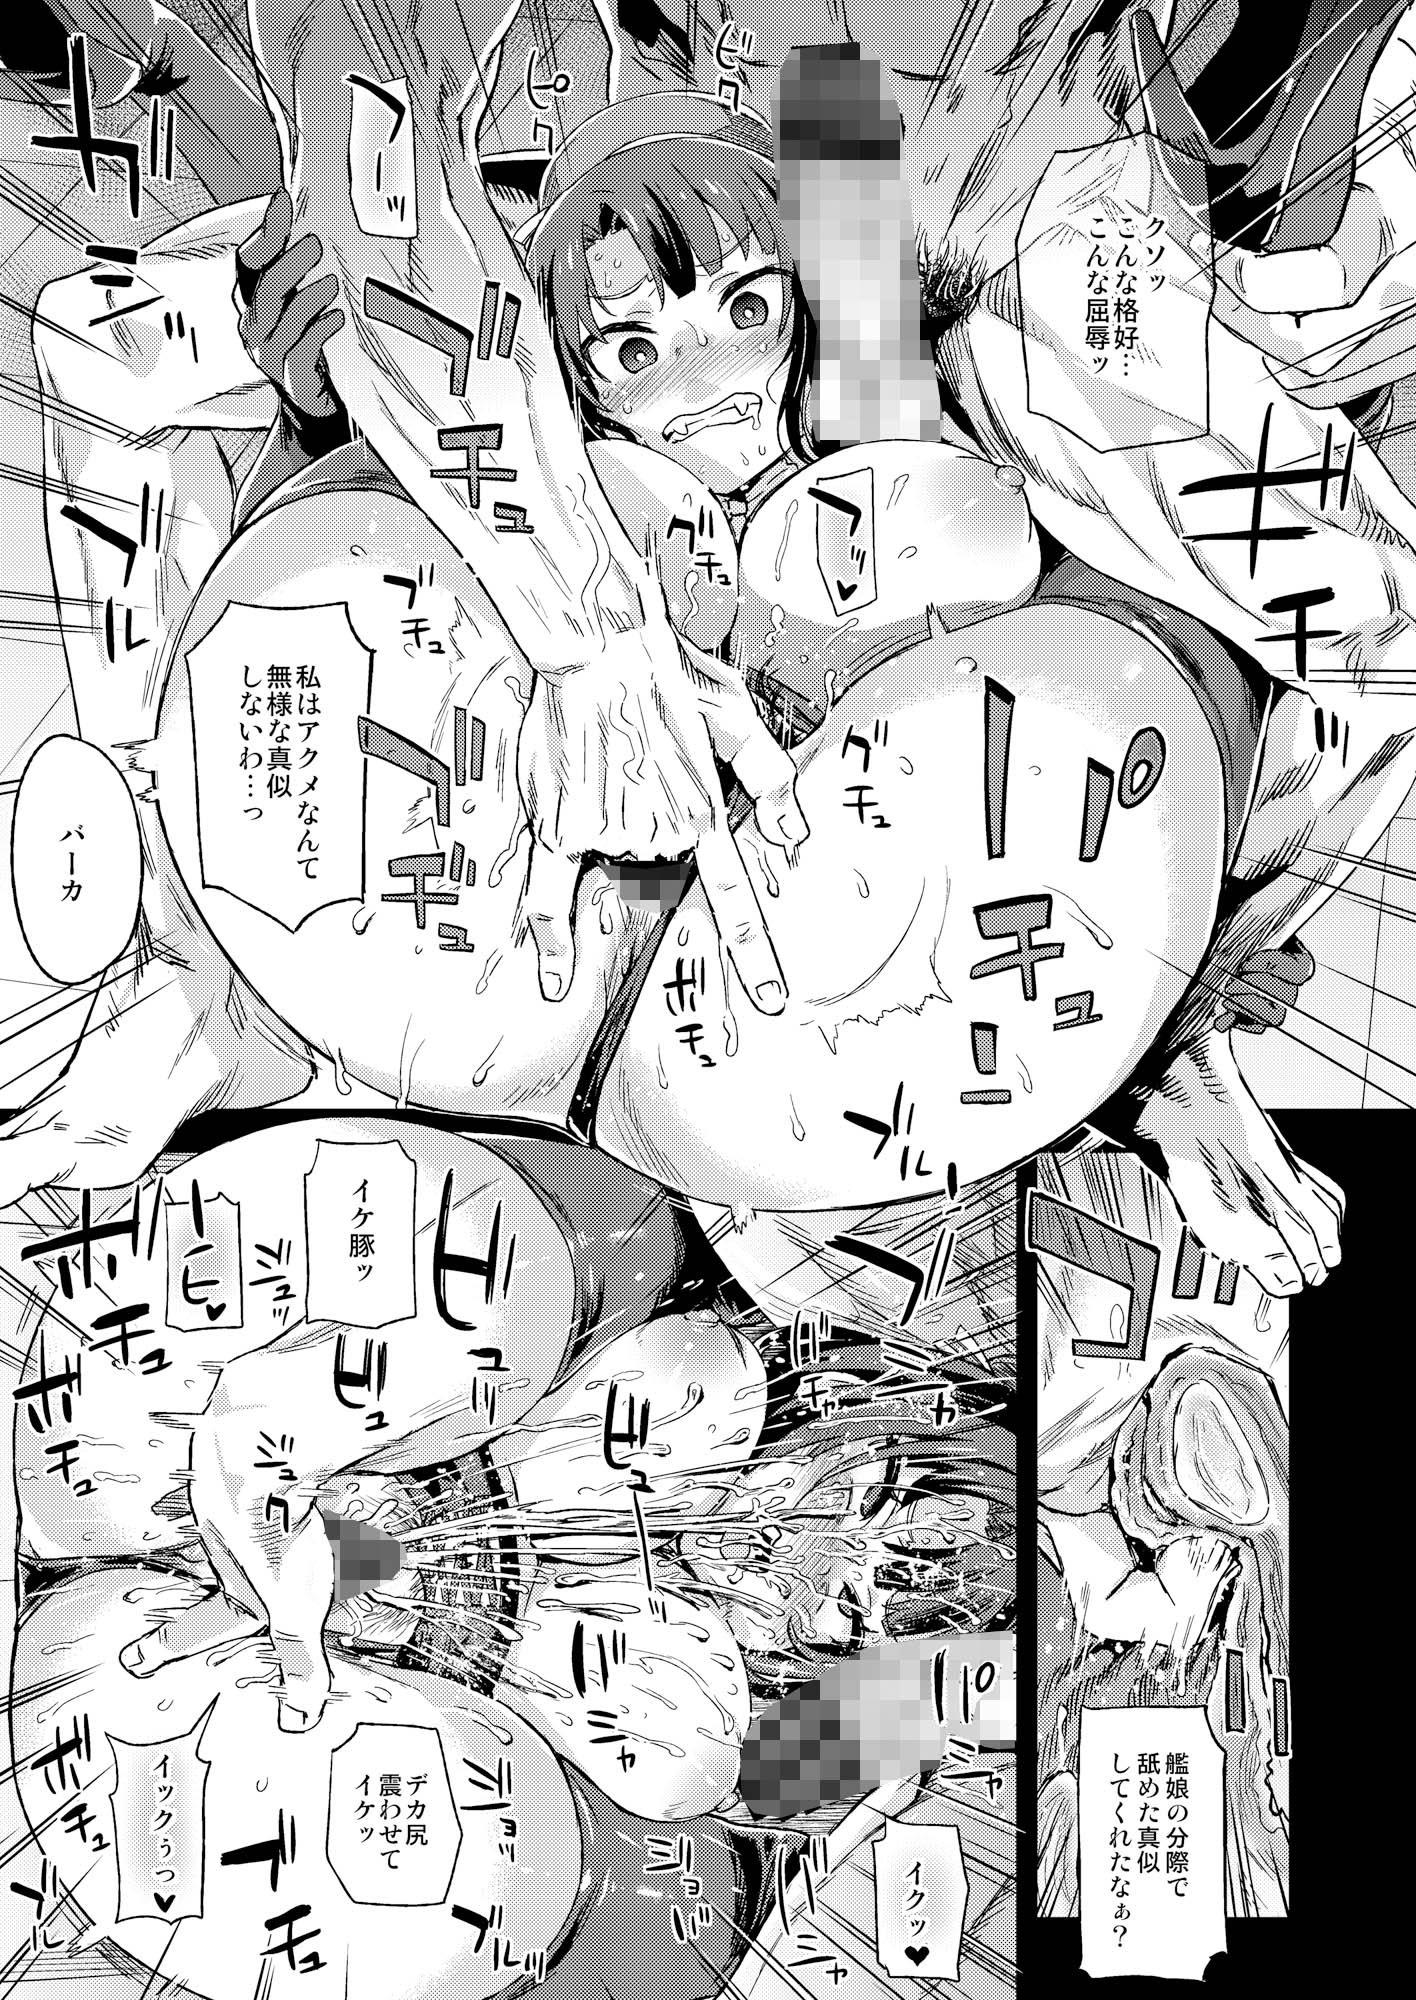 [調教・奴隷]「オトコの娘奴隷」(若宮参太)